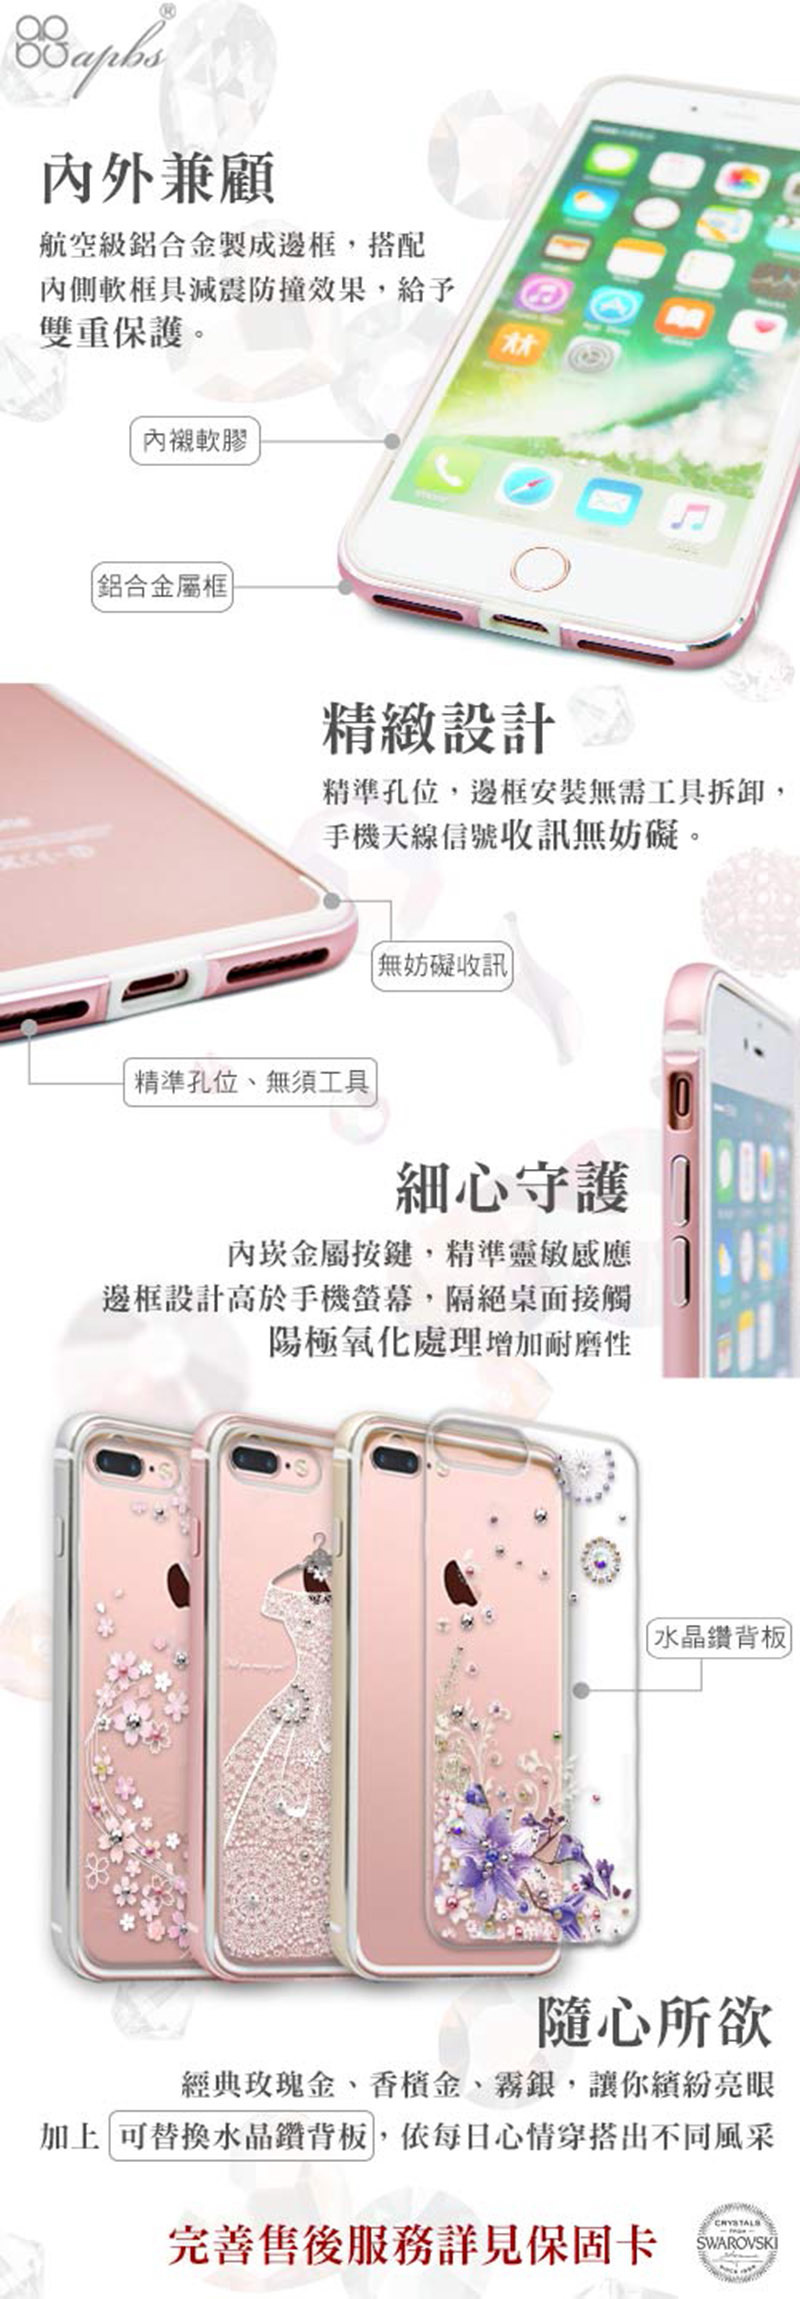 APBS iPhone X/8/7 Plus 施華洛世奇 相愛樹水鑽背板+金屬邊框